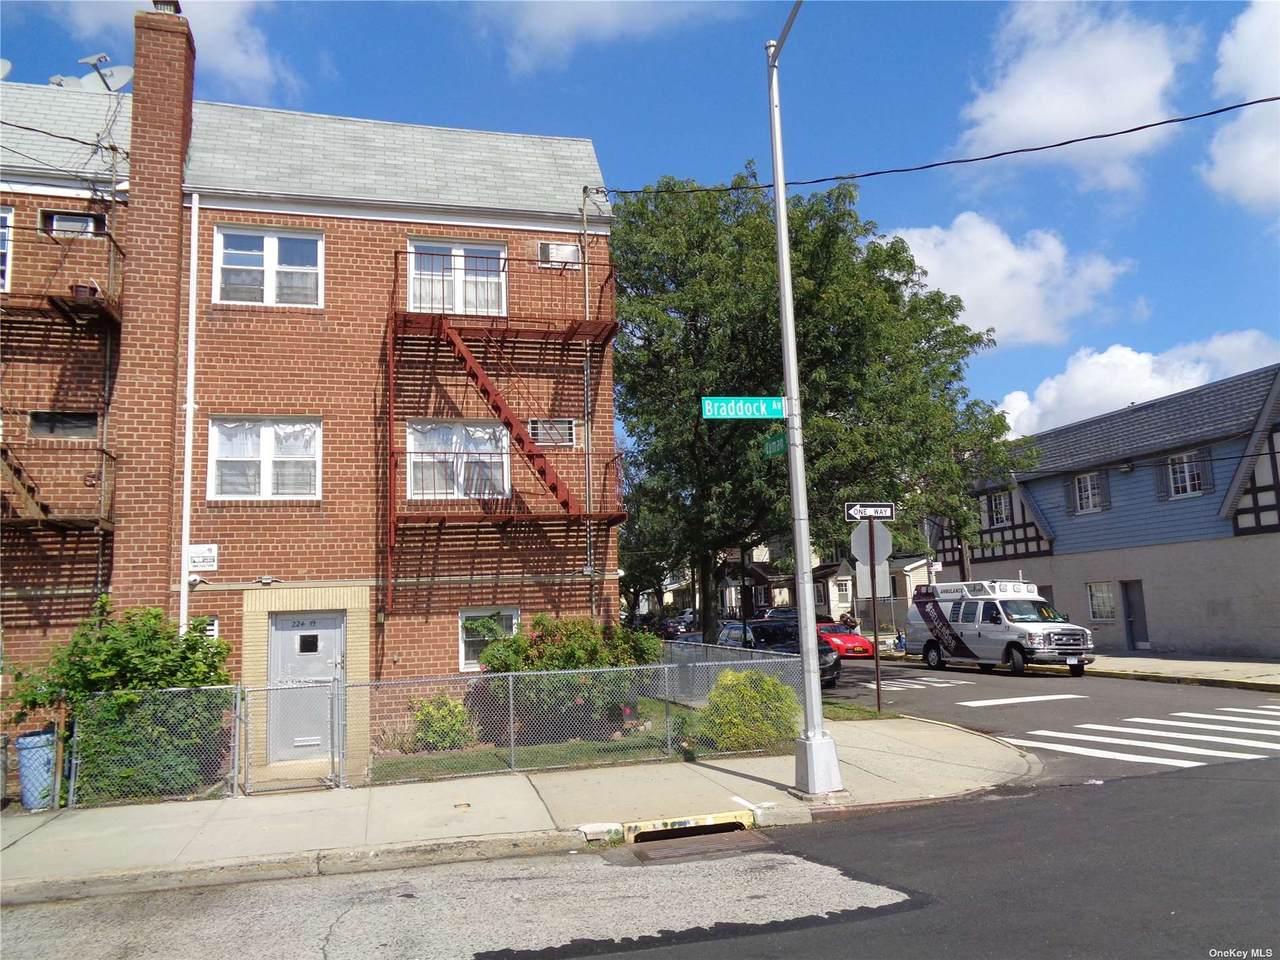 224-19 Braddock Ave - Photo 1